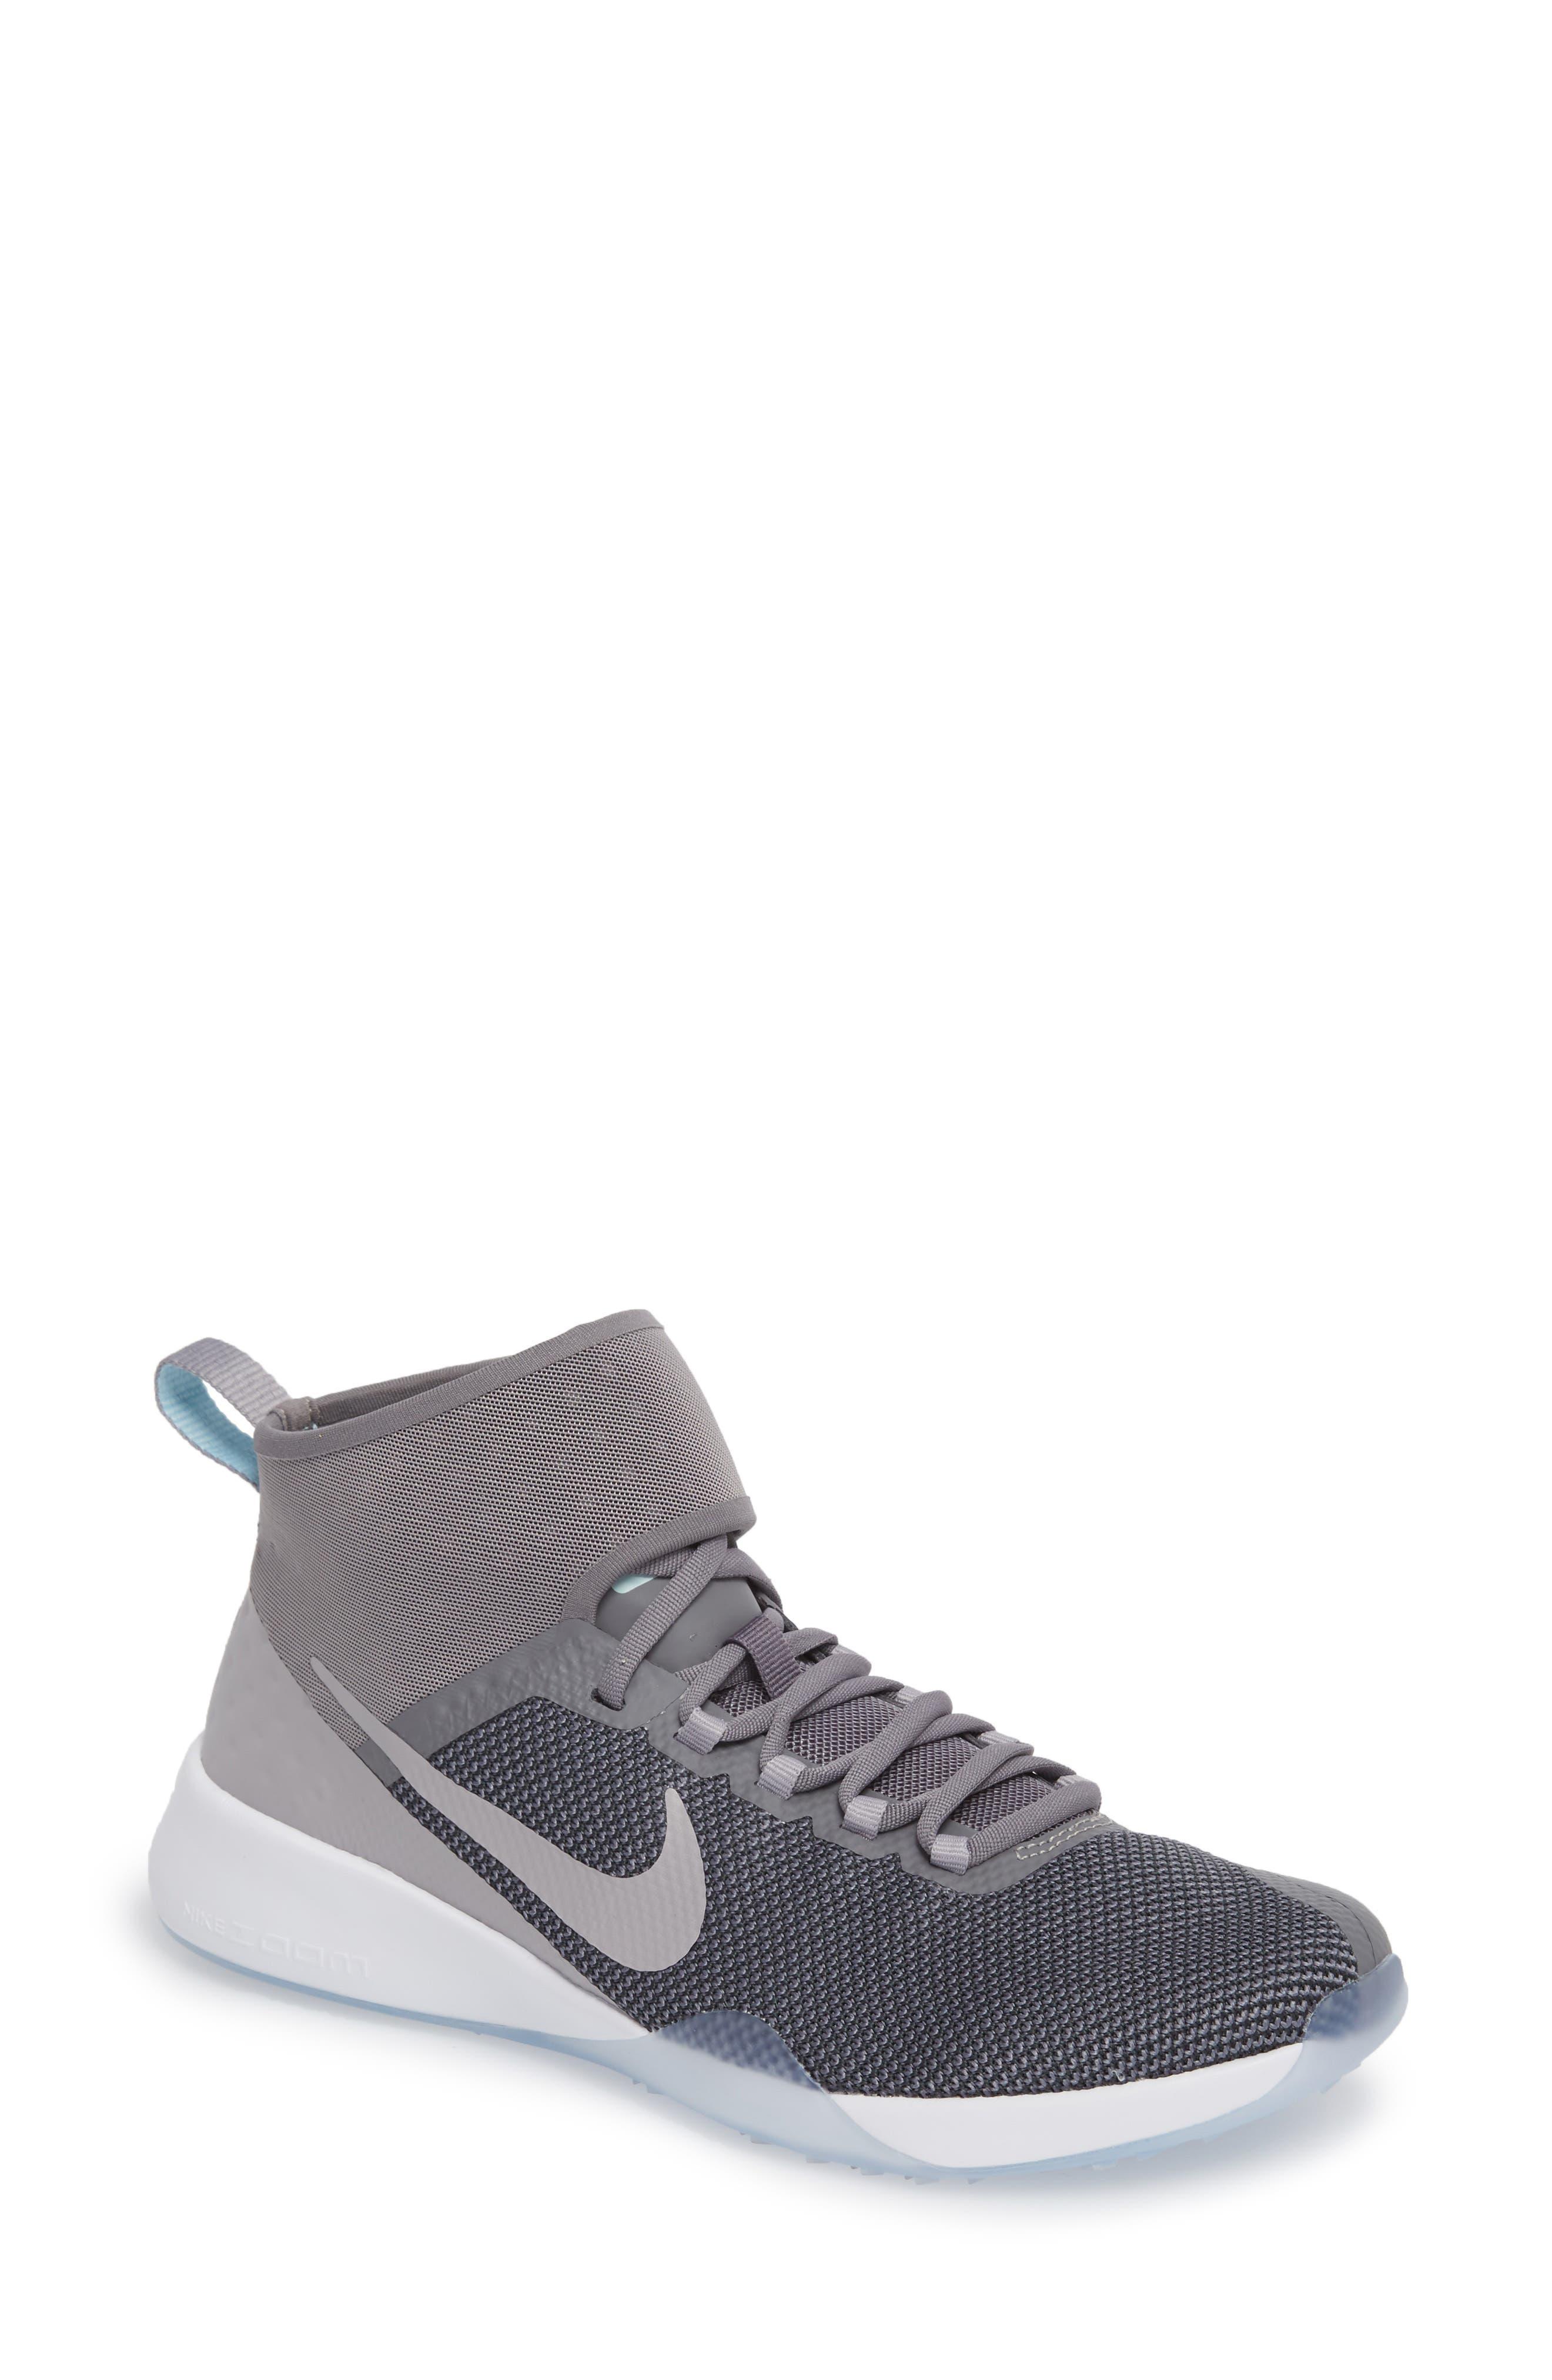 NikeLab Air Zoom Strong 2 Training Shoe,                             Main thumbnail 1, color,